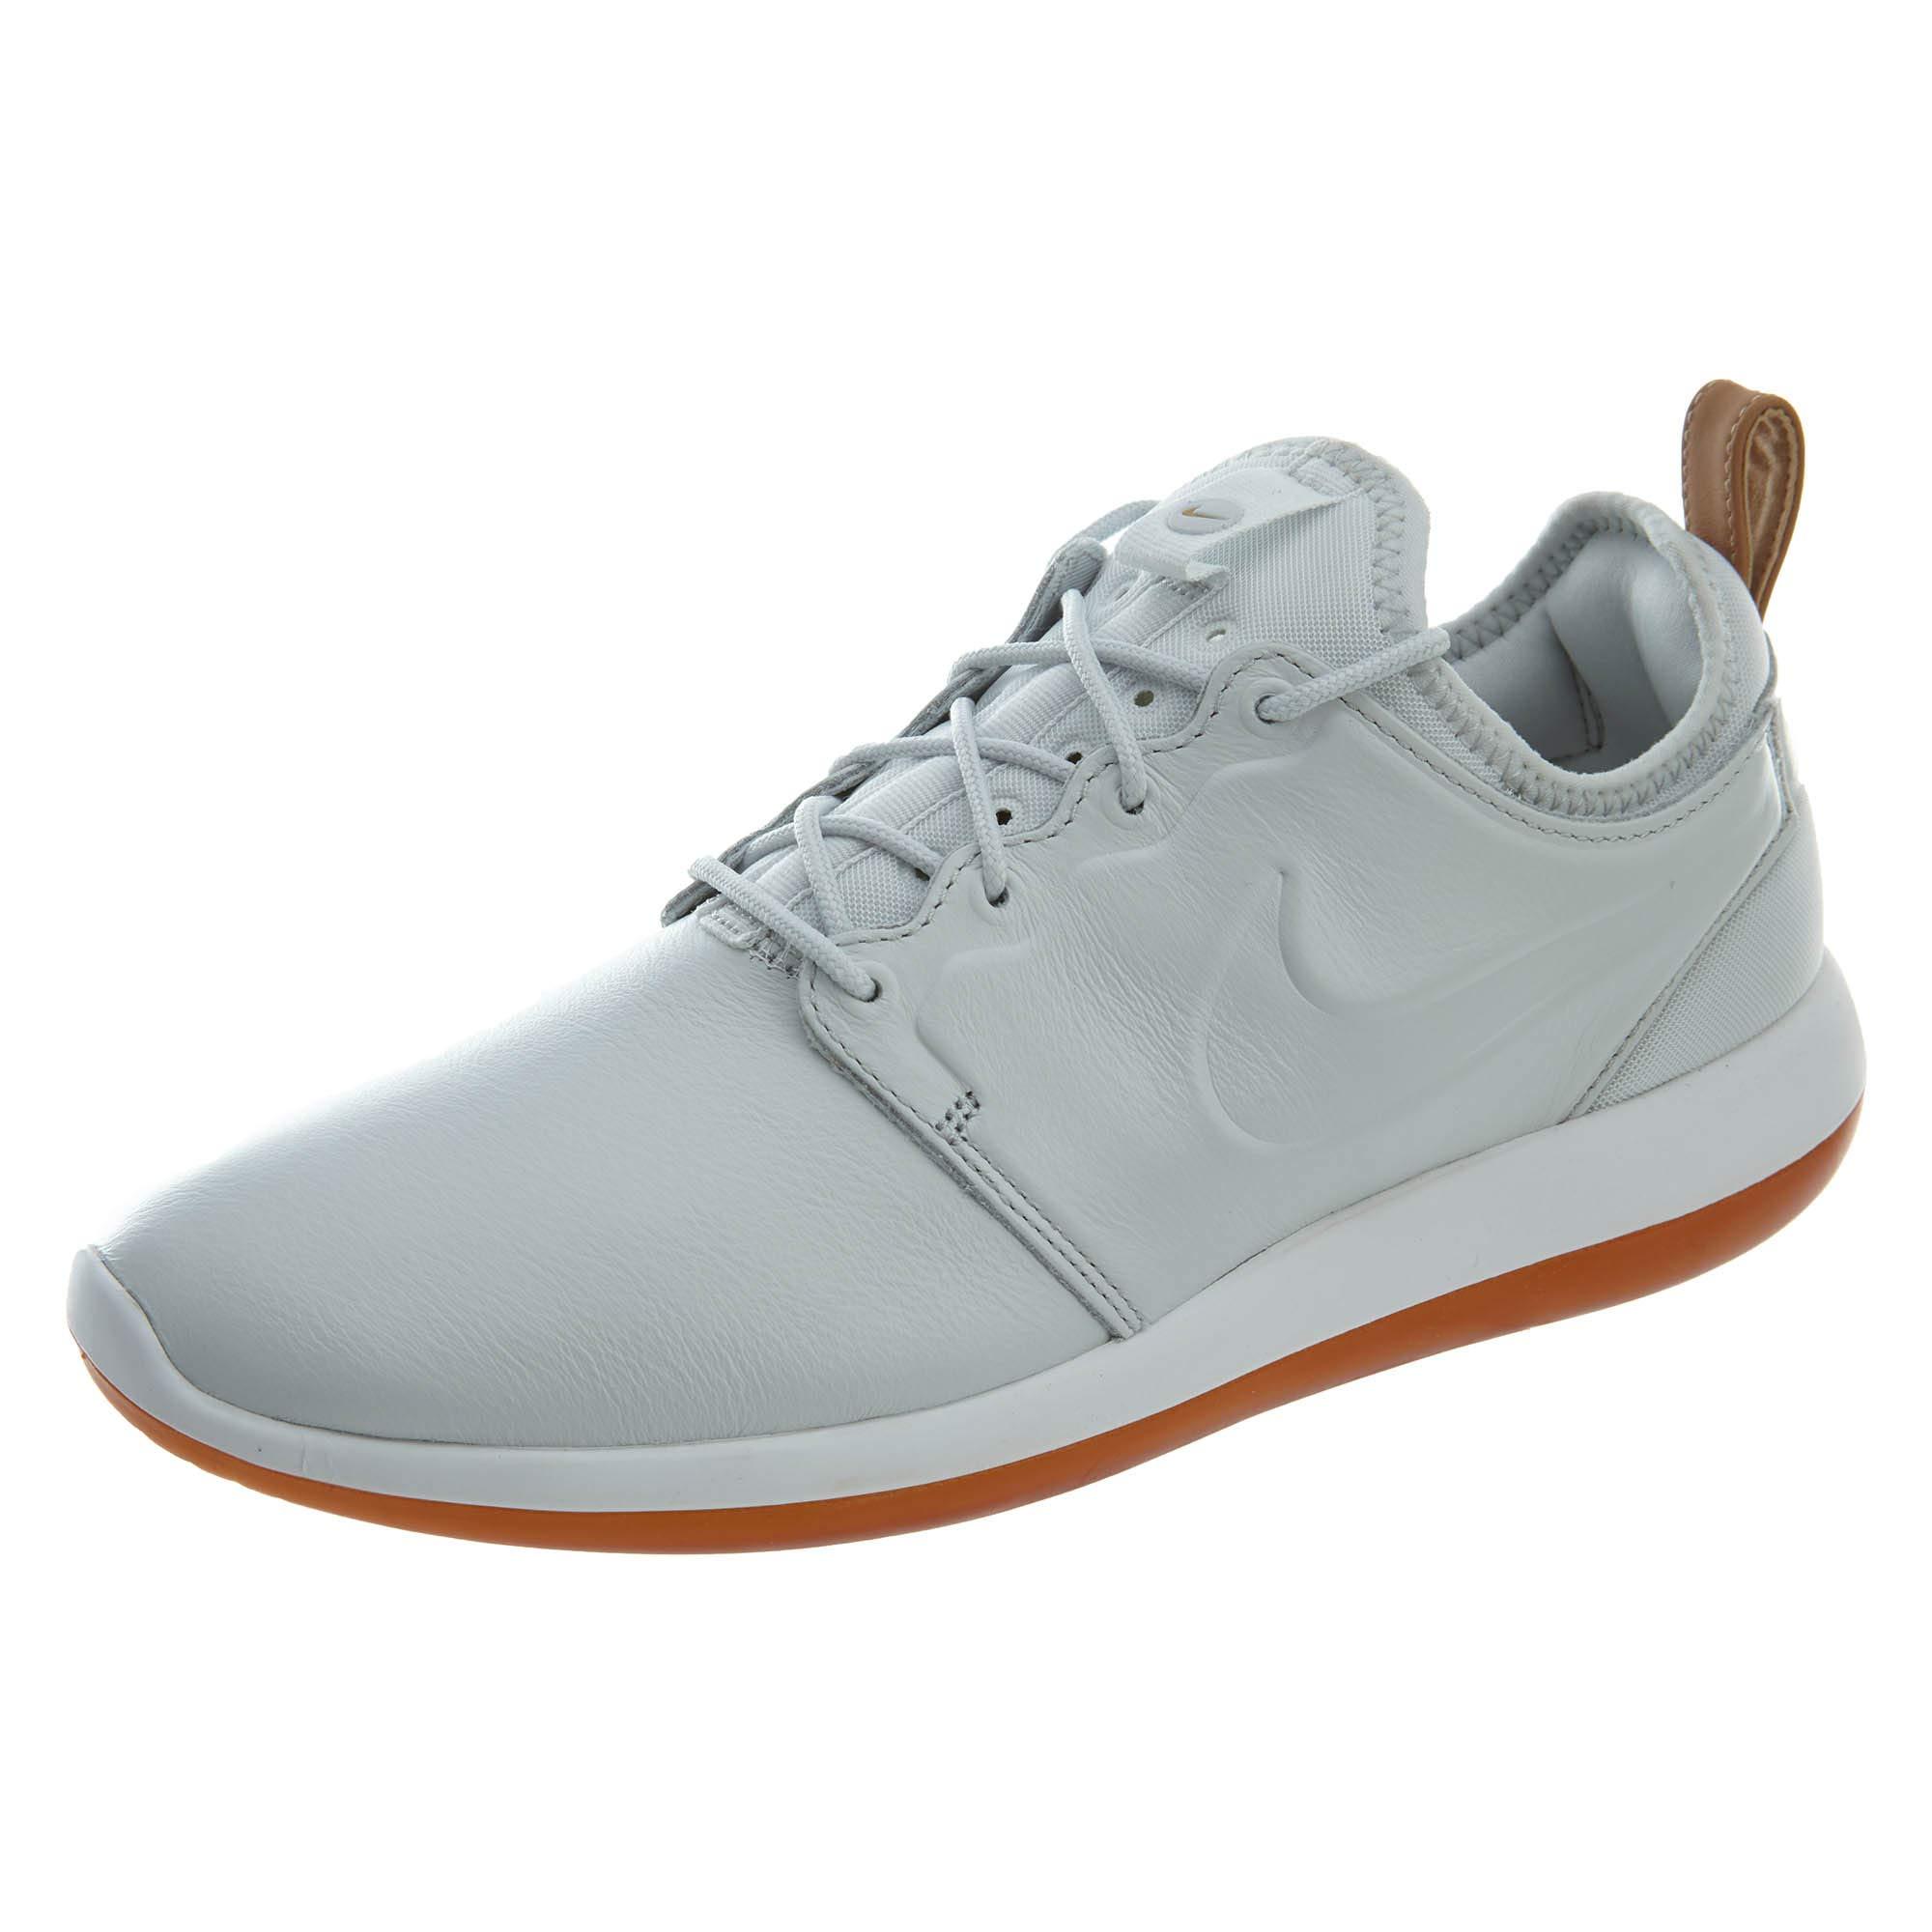 Nike Roshe Two Leather Premium- Buy